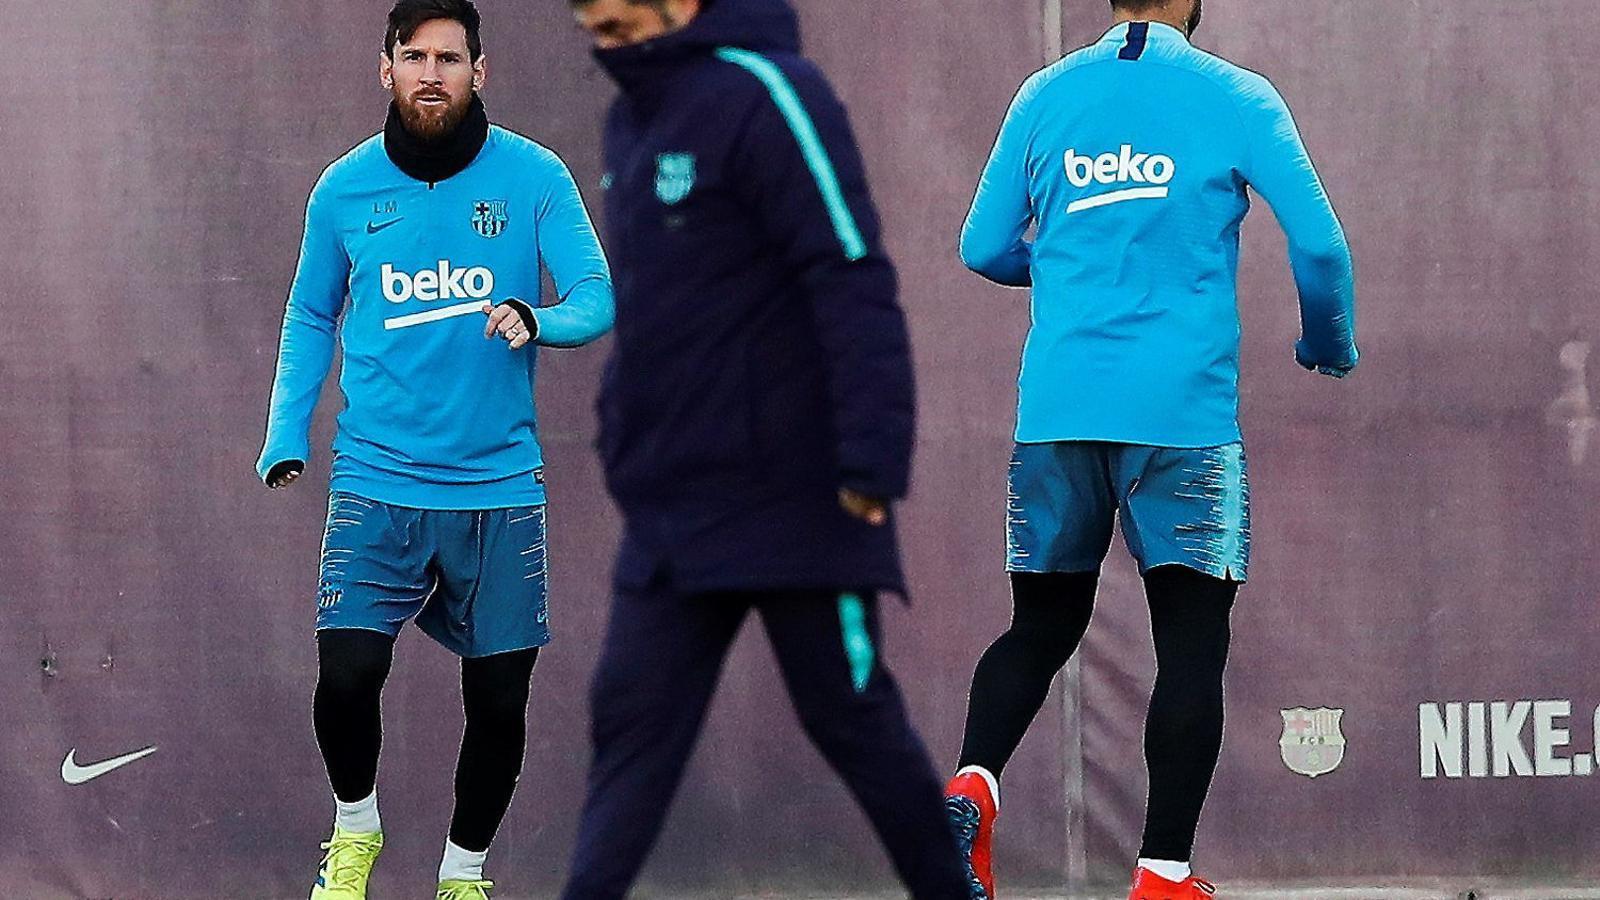 Leo Messi, davanter argentí del Barça Lassa.